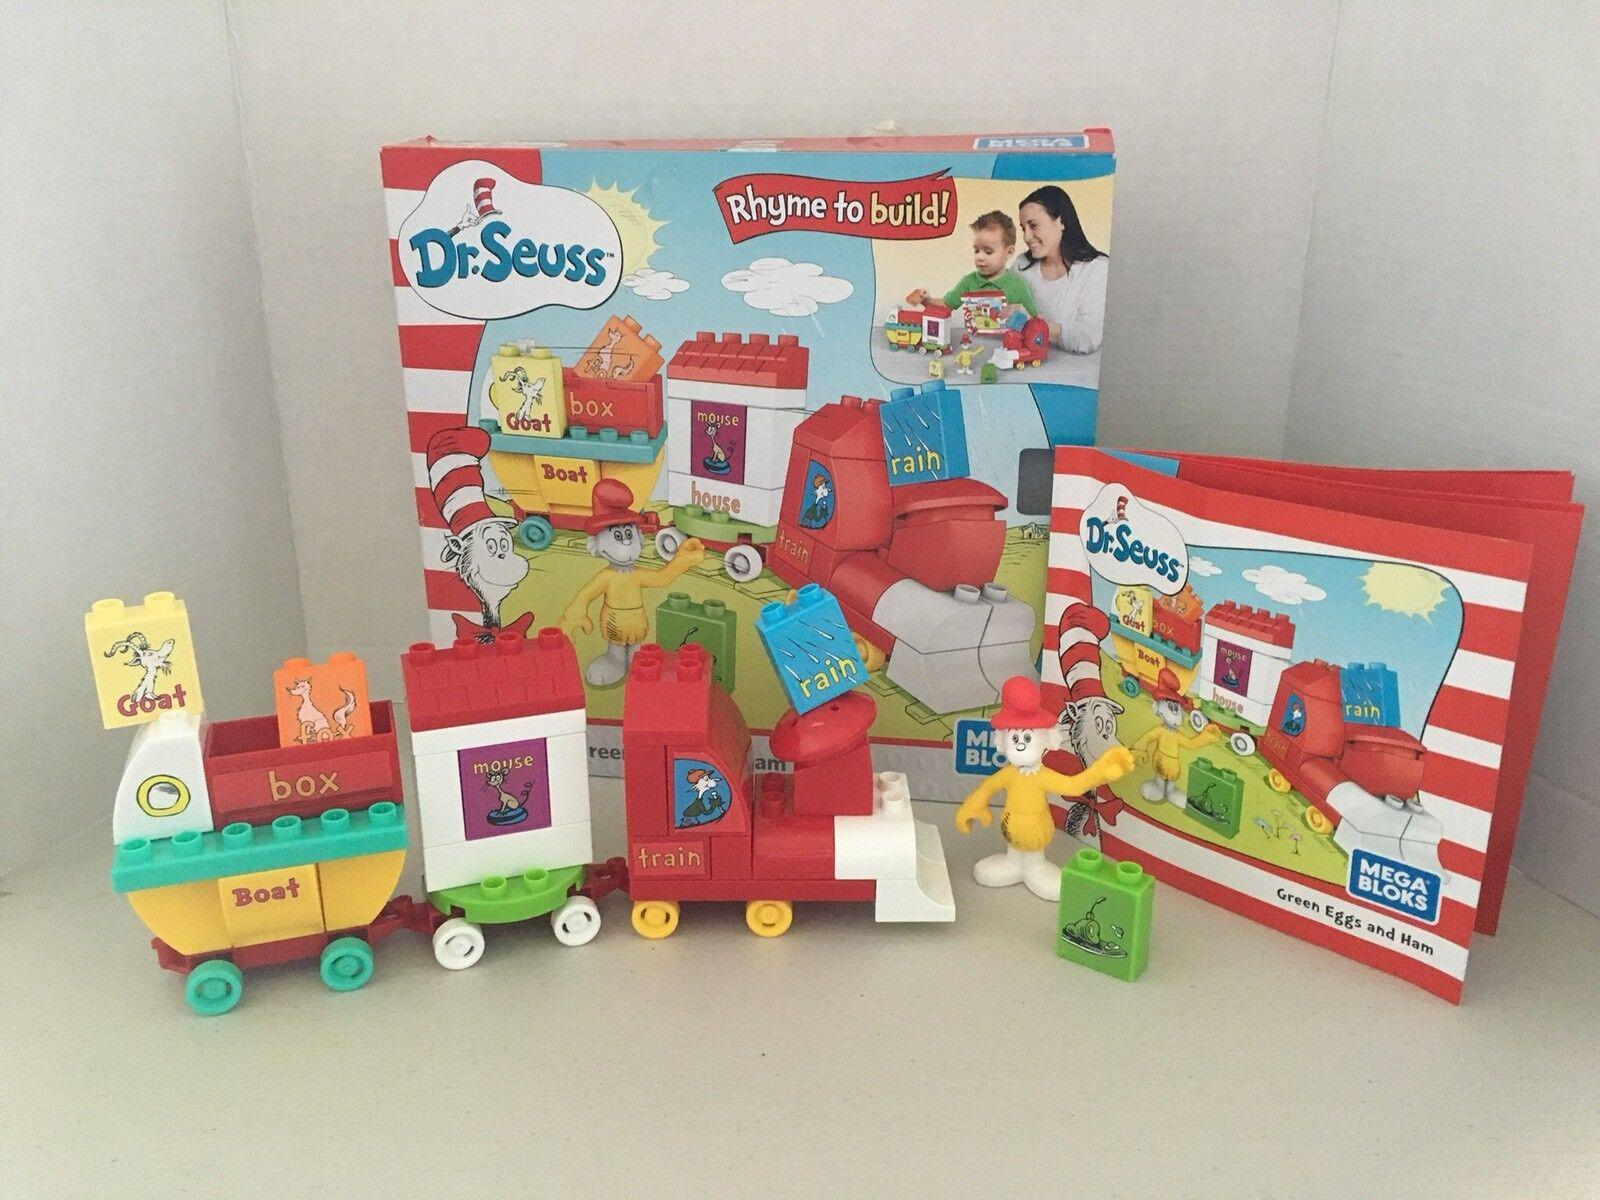 Dr. Seuss Mega Bloks Green Eggs And Ham Train Preschool Rhyming Educational